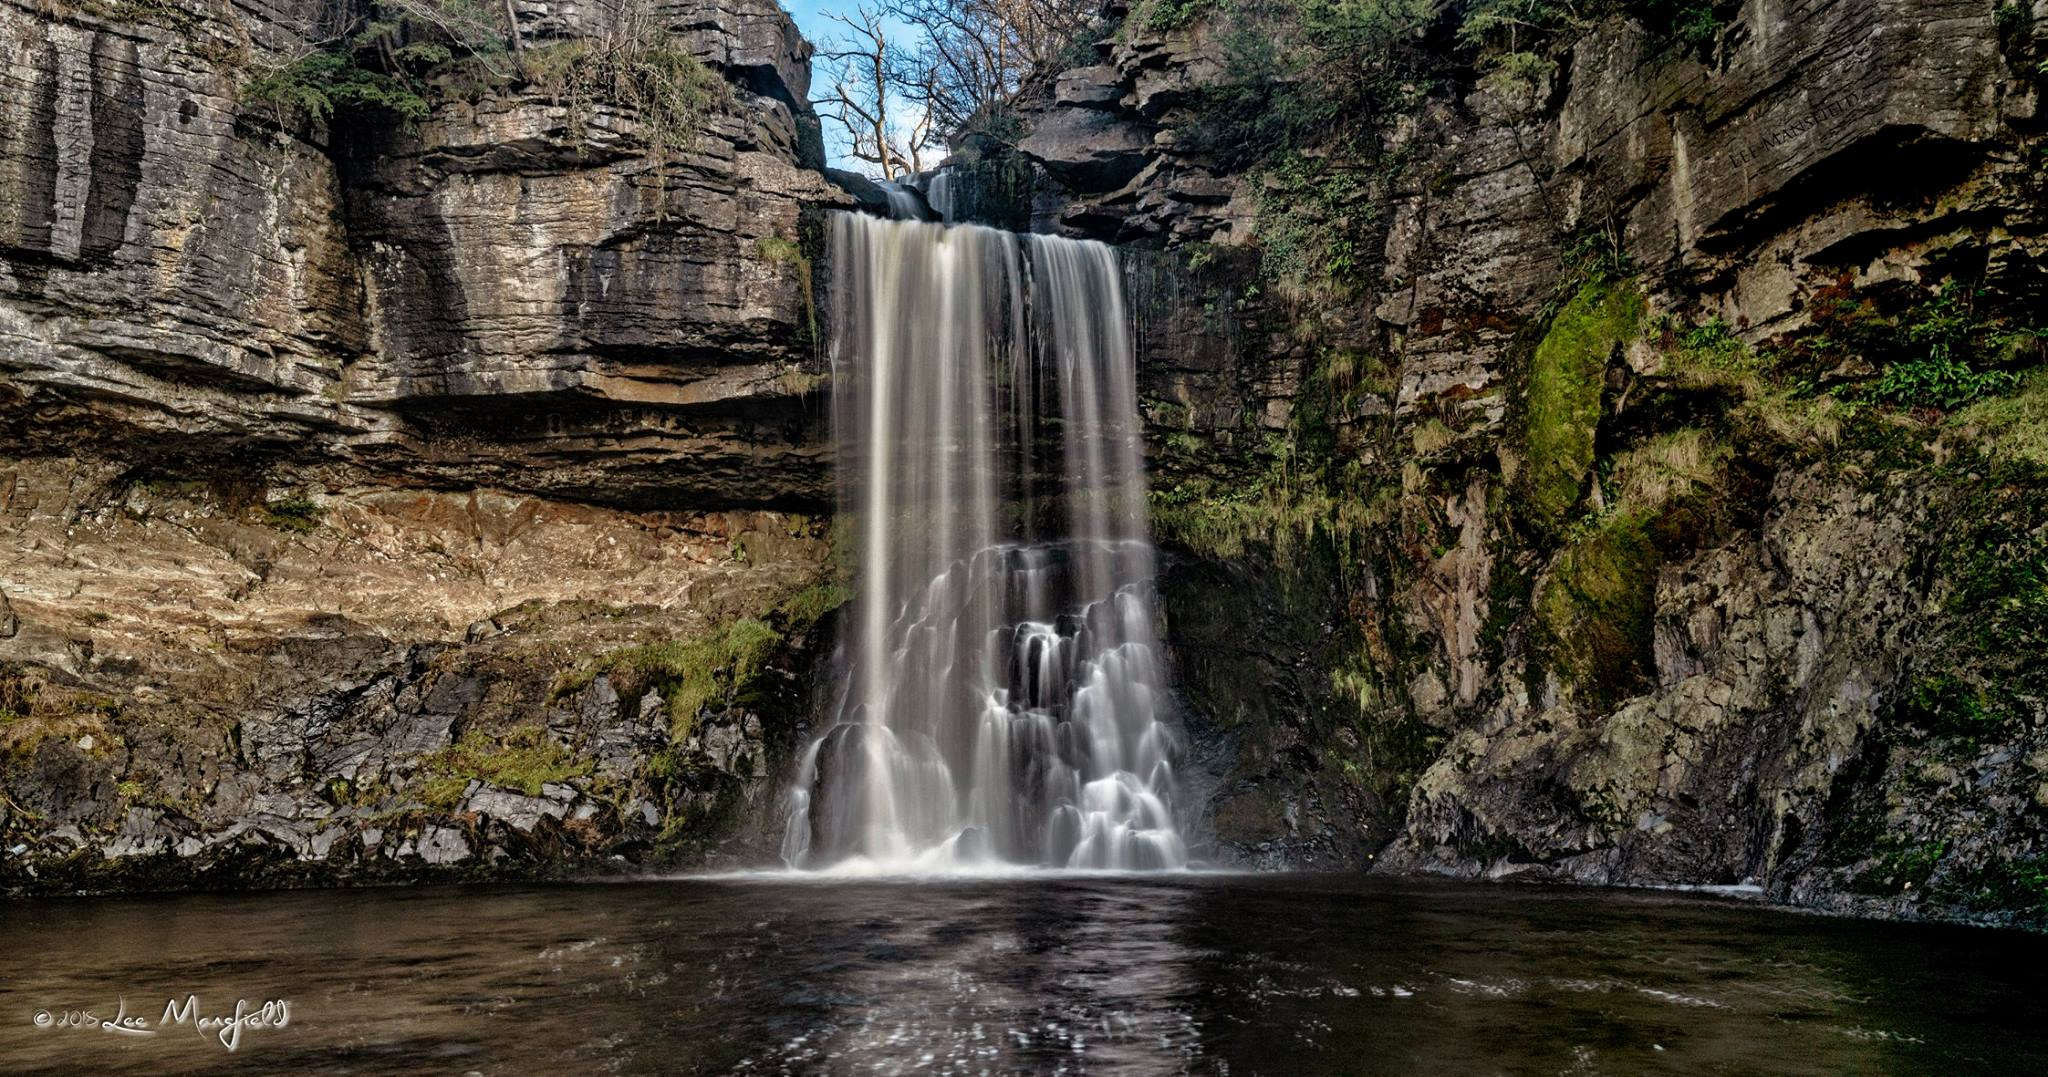 Thornton Force Waterfall, Ingelton Falls